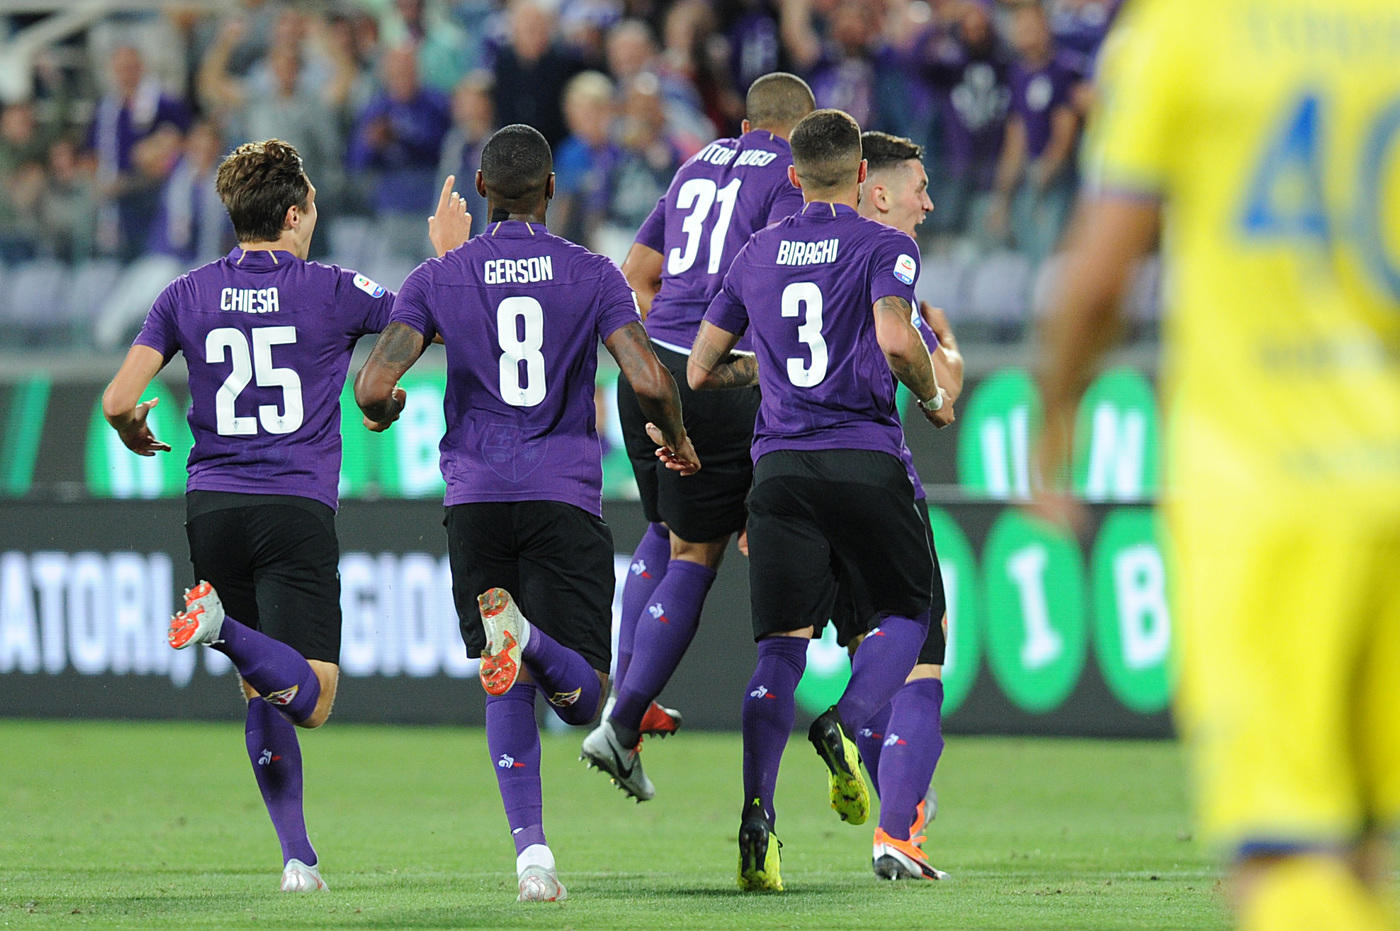 Fiorentina, 6 stupenda: Chievo umiliato 6-1